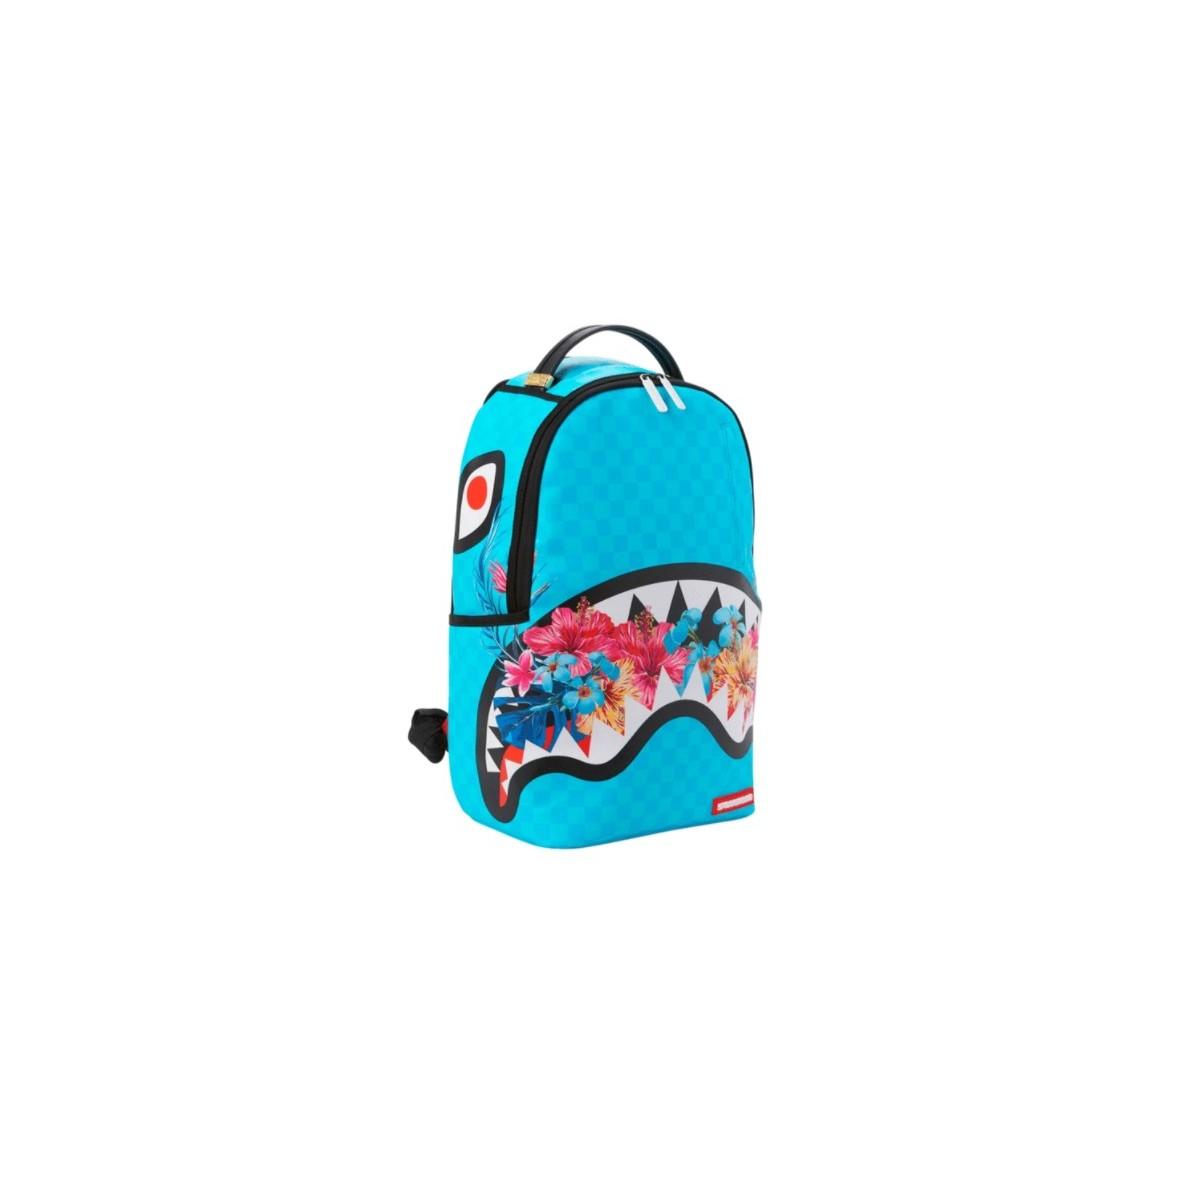 Zaino - Blossom shark 2342